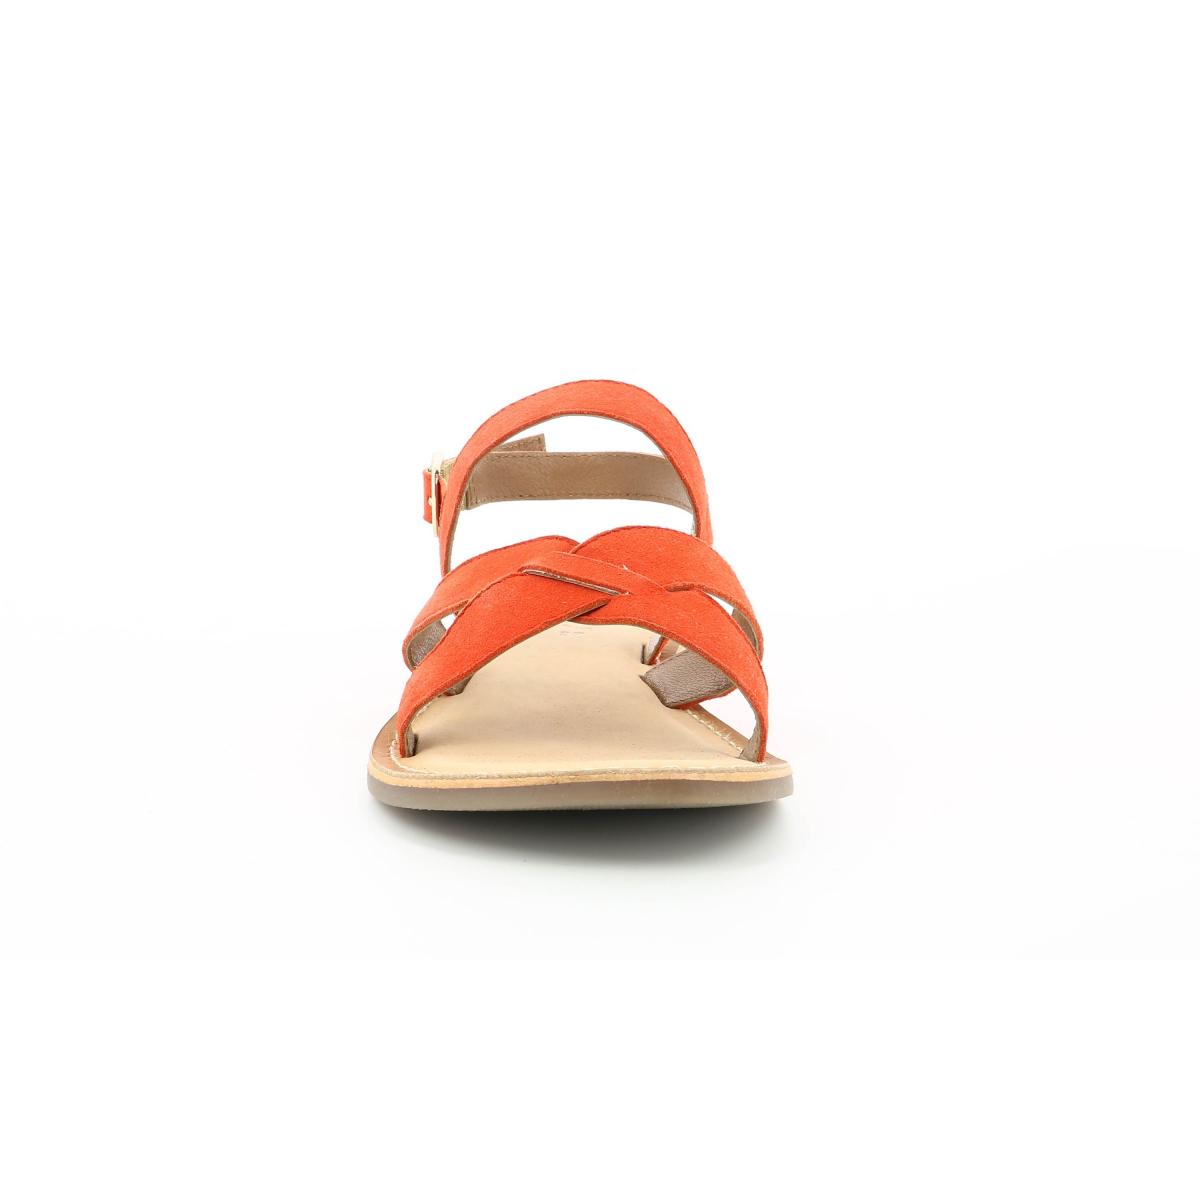 Kickers Chaussures Femme Orange Orange Chaussures Femme Diba Diba OZkuTwPXi